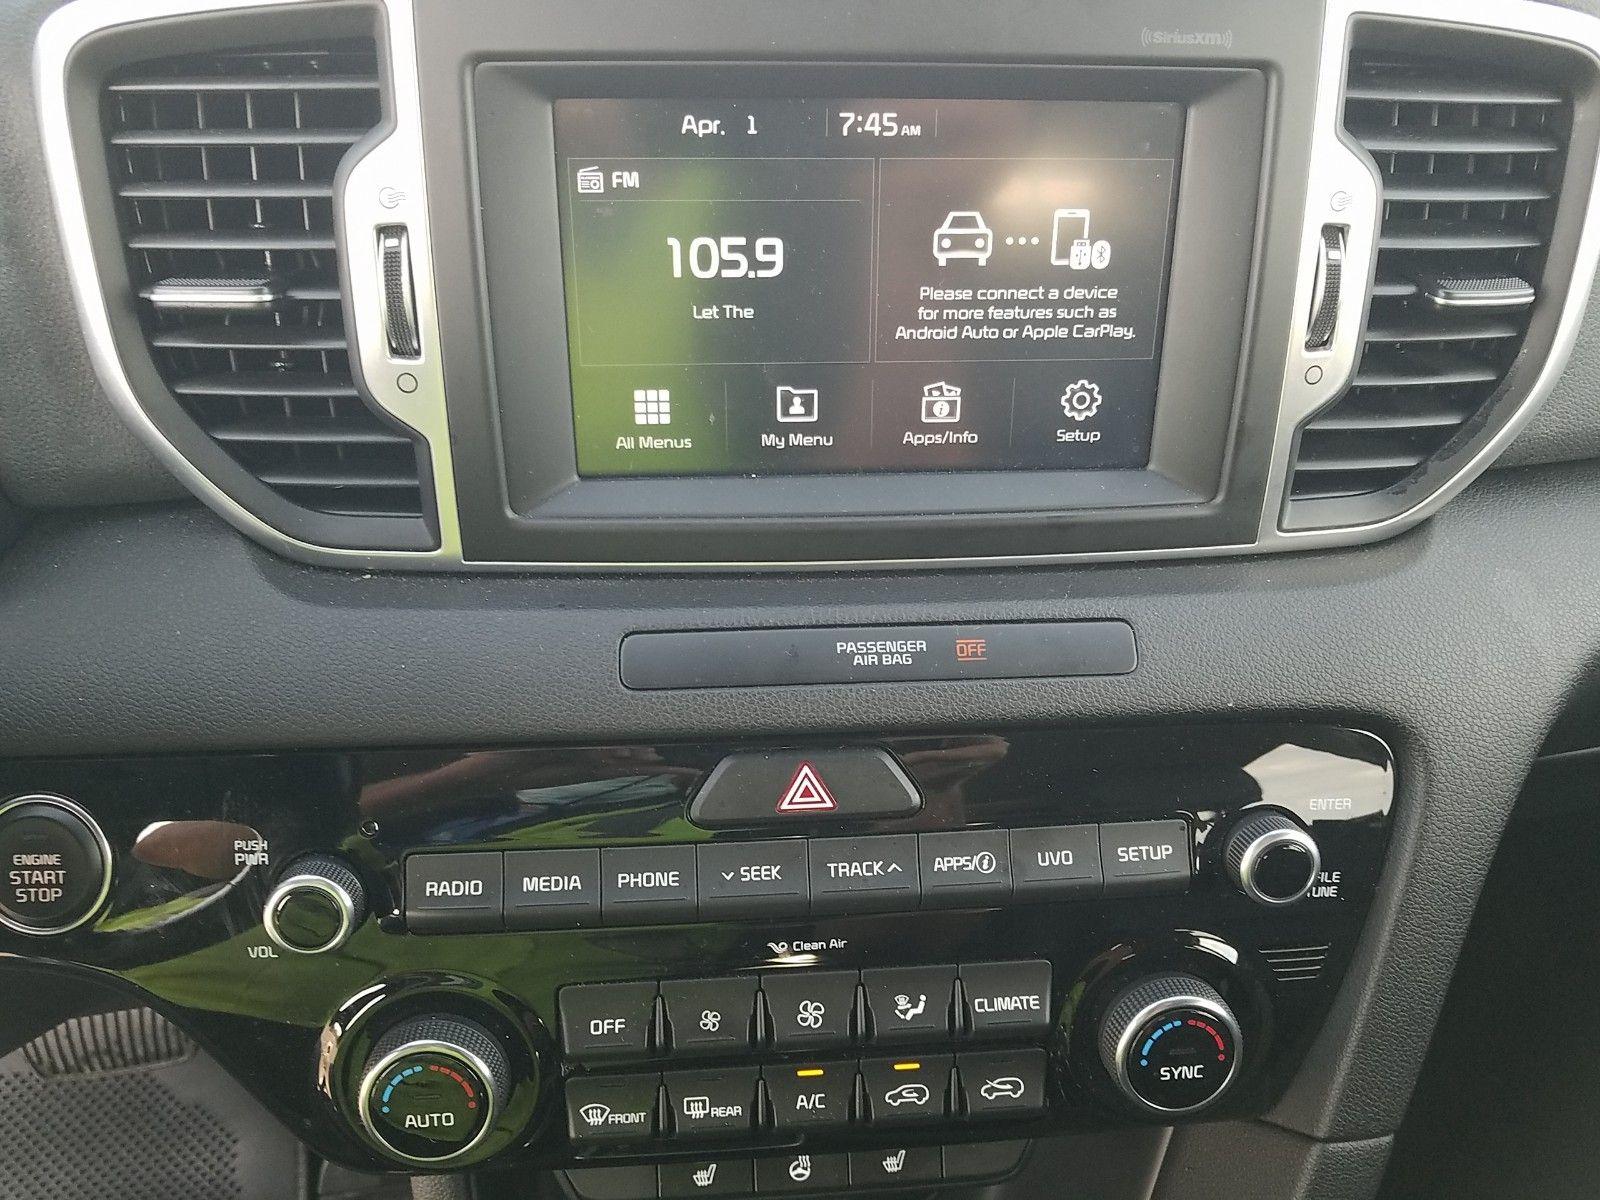 2019 KIA SPORTAGE FWD 4C EX - 11